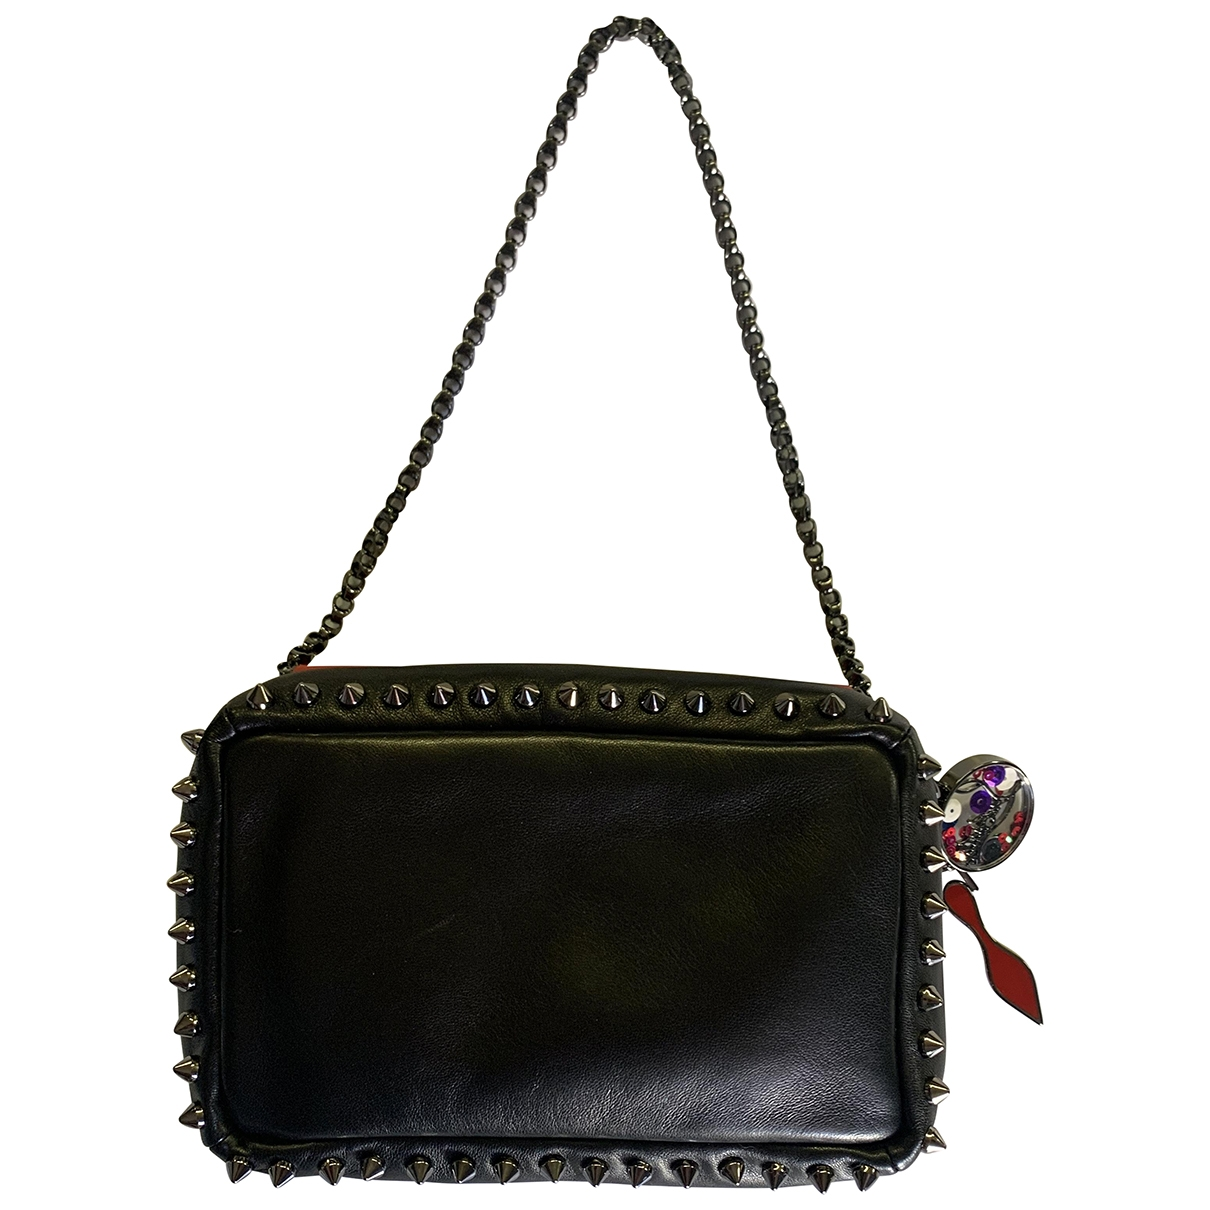 Christian Louboutin \N Black Leather Clutch bag for Women \N